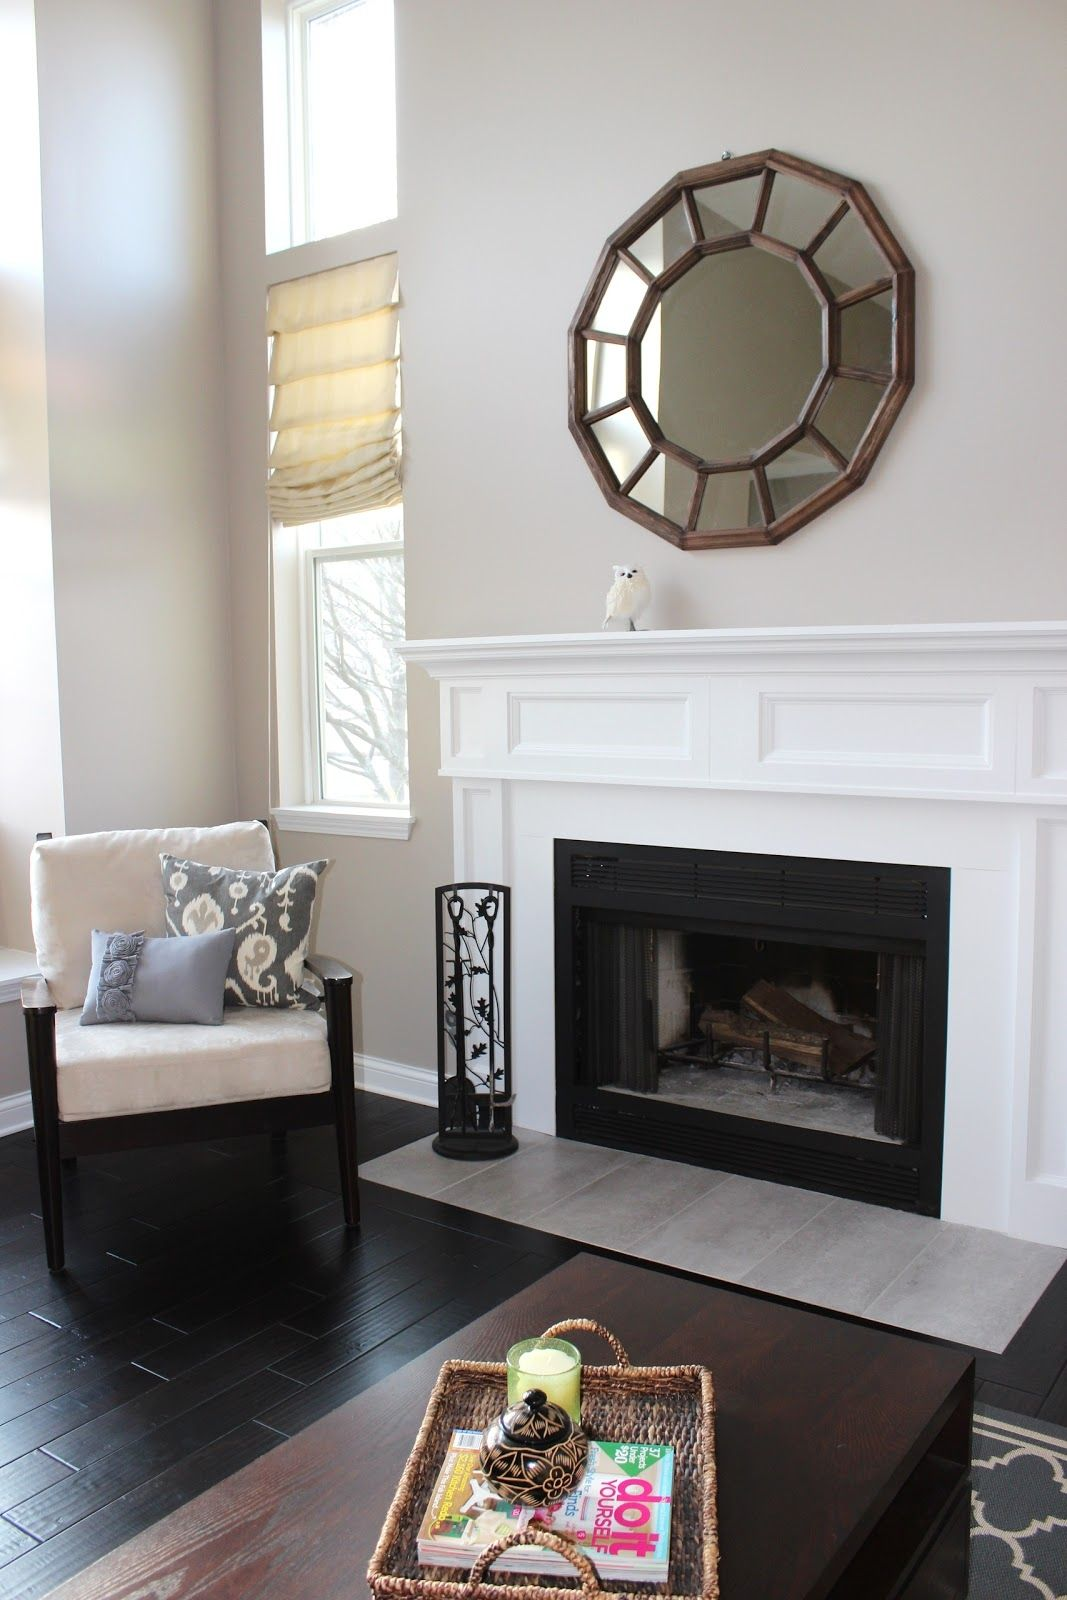 35 Wall Decor Above Fireplace Mantel